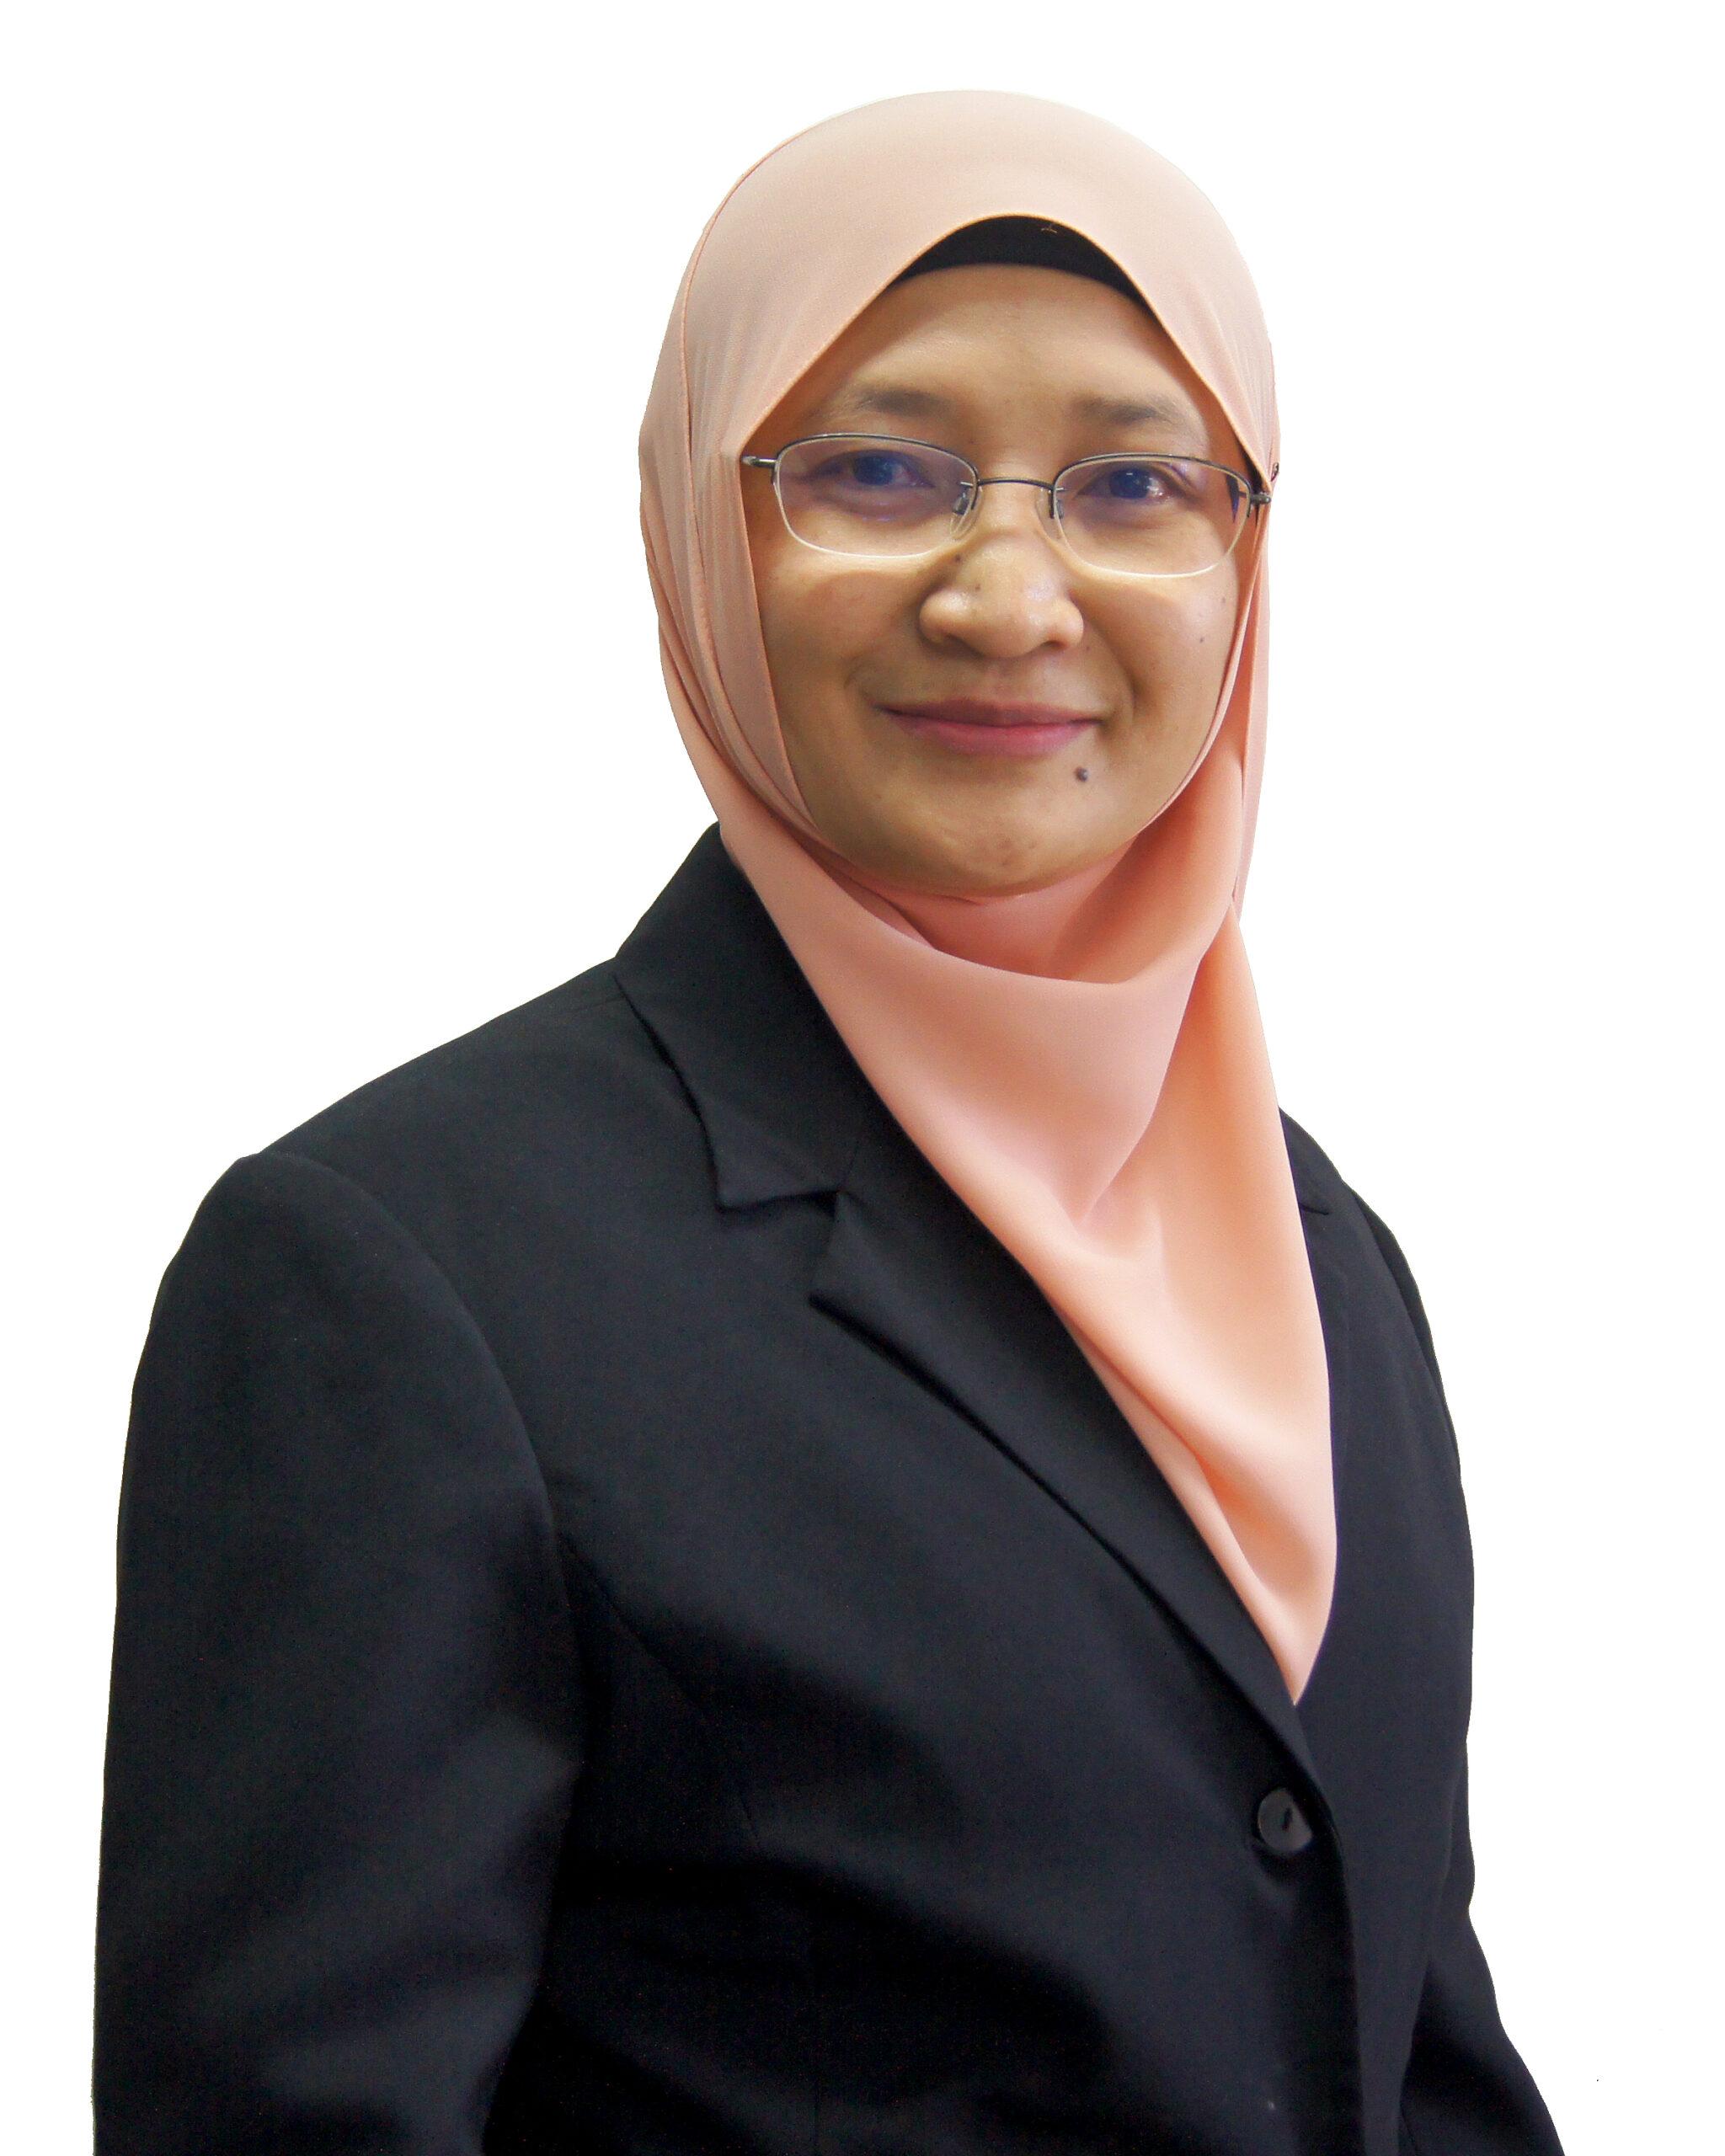 Noor 'Azlinda Binti Maskor